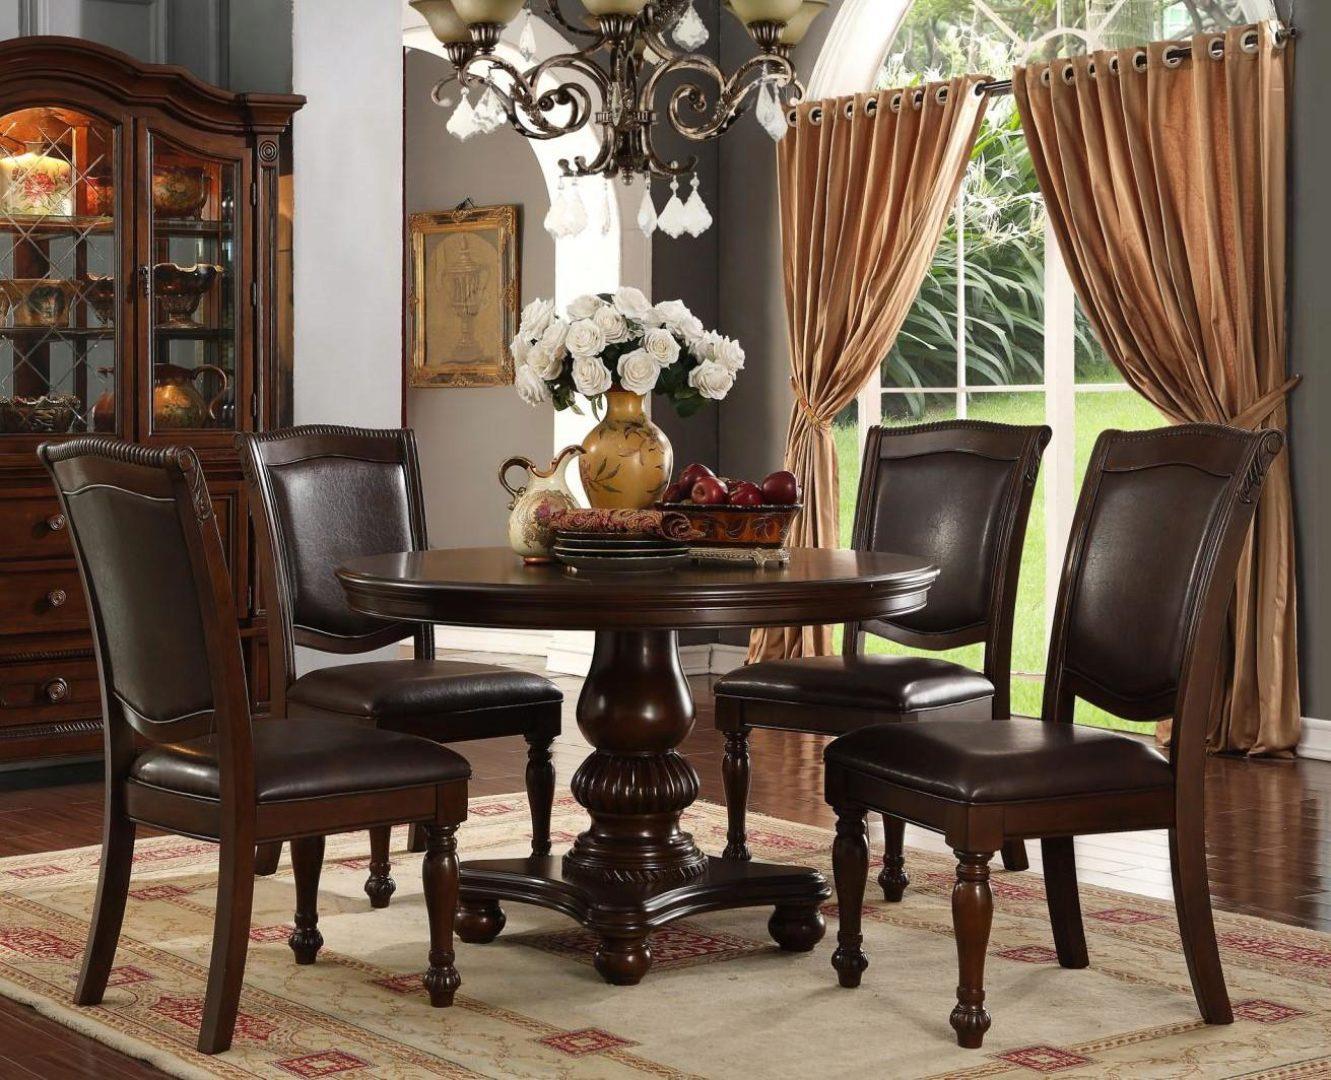 Brown Rich Wood Round Dining Table Set 5pcs Mcferran D7900 4848 D7900 4848 Set 5